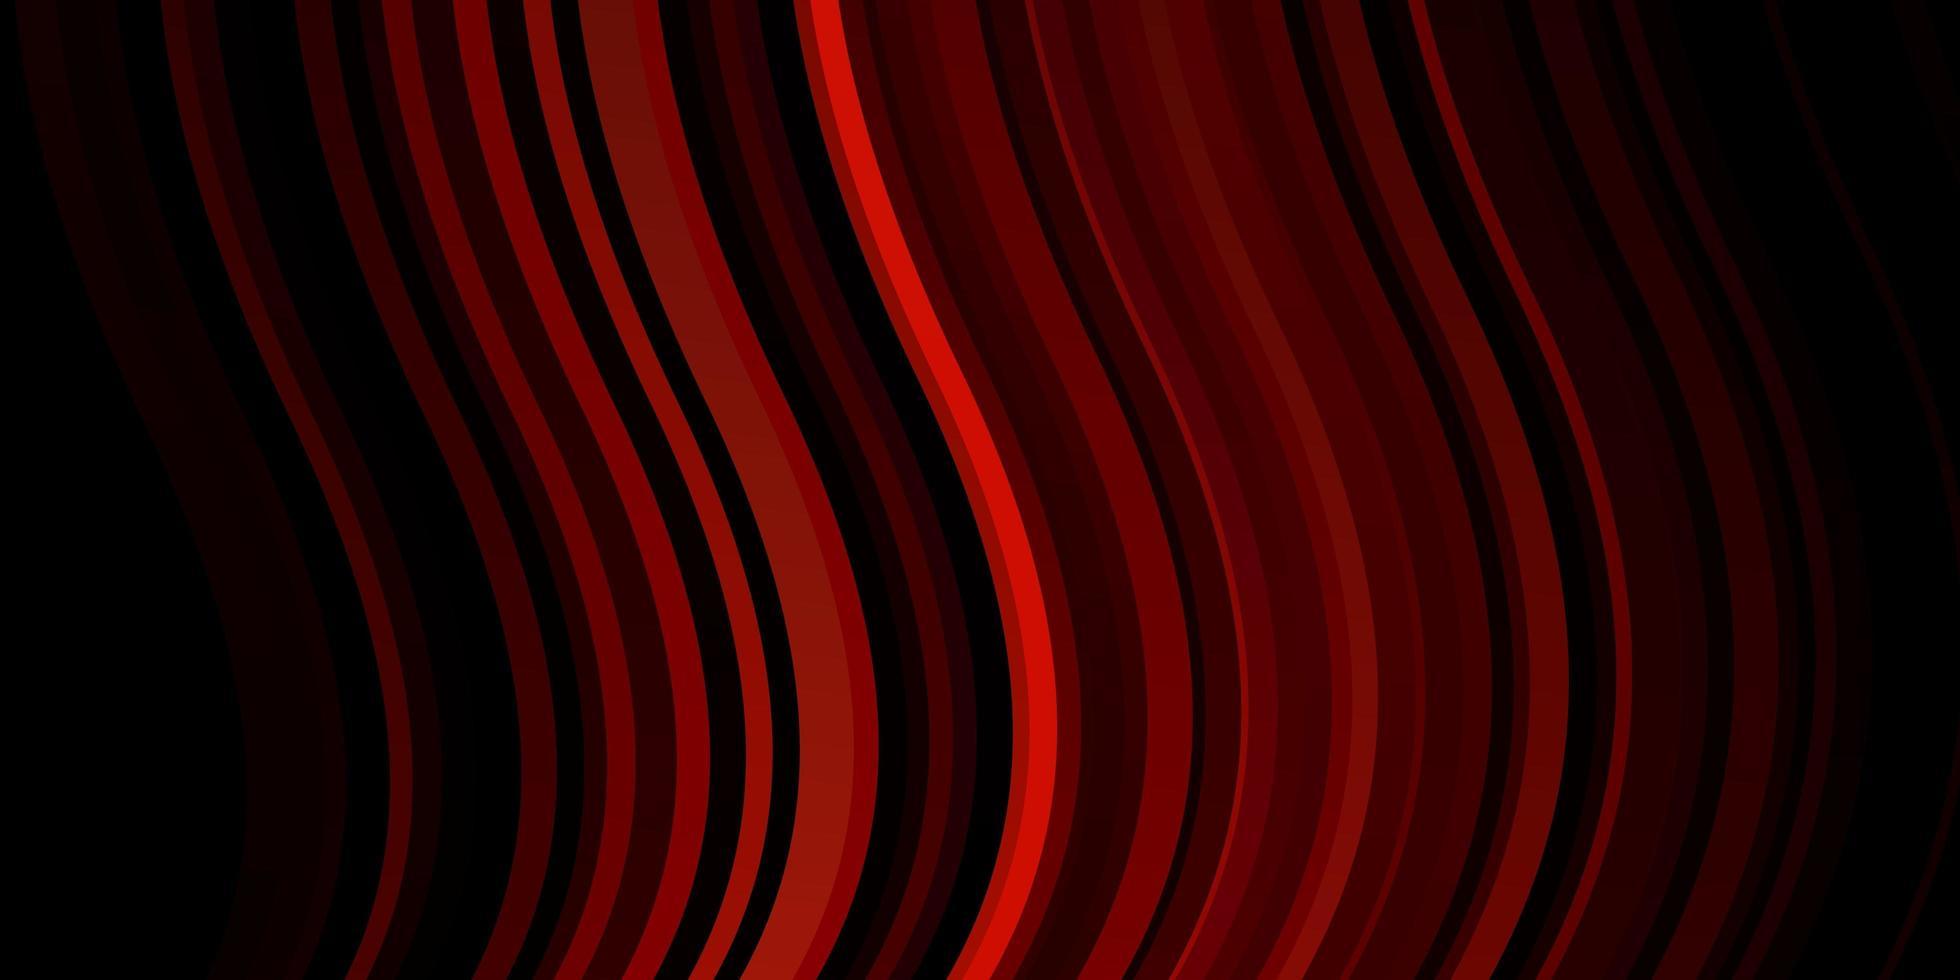 textura de vector de color rosa oscuro, rojo con líneas torcidas.